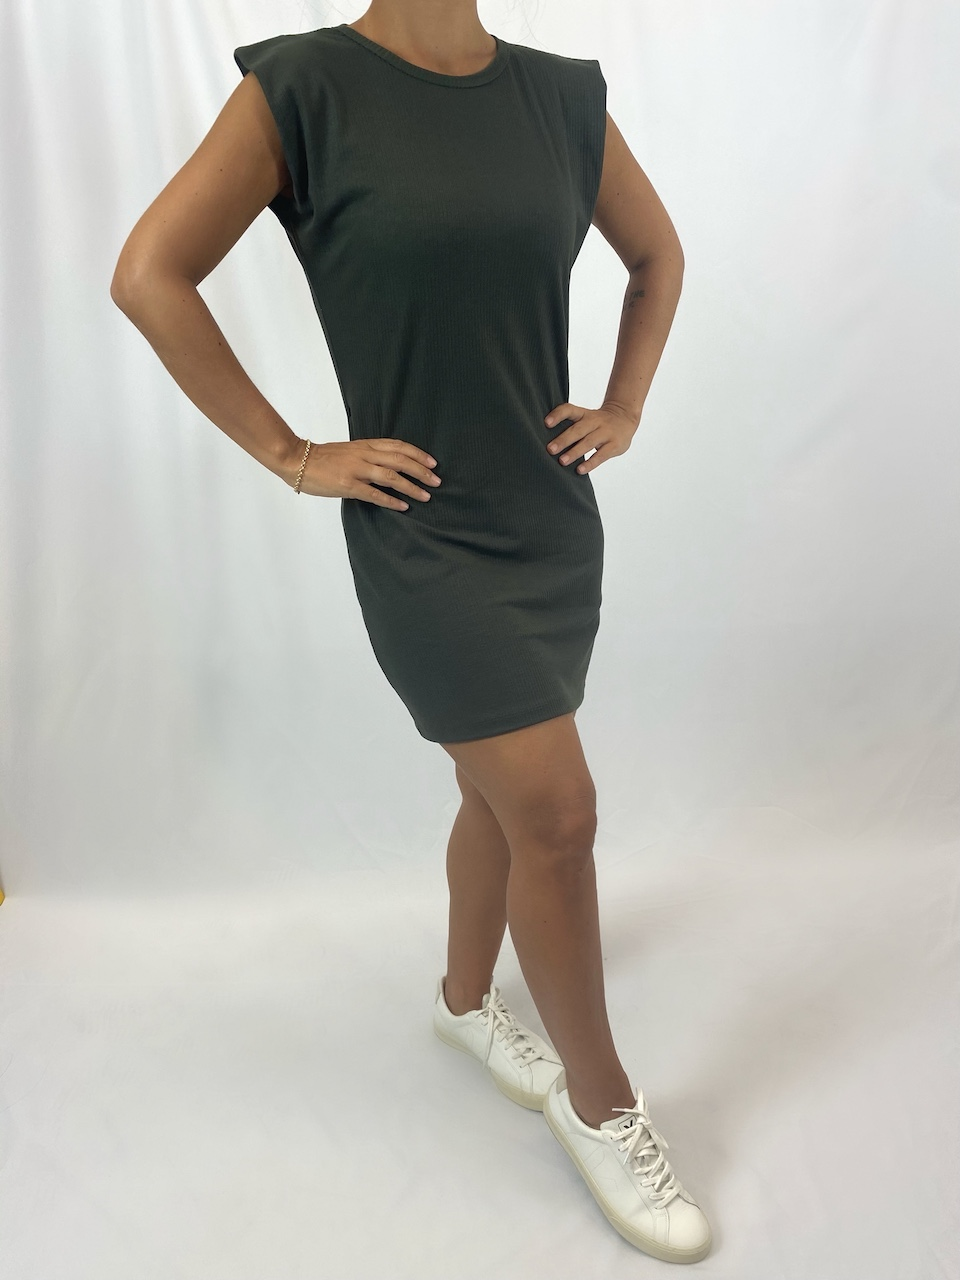 Vestido Canelado Muscle Feminino - Verde Escuro